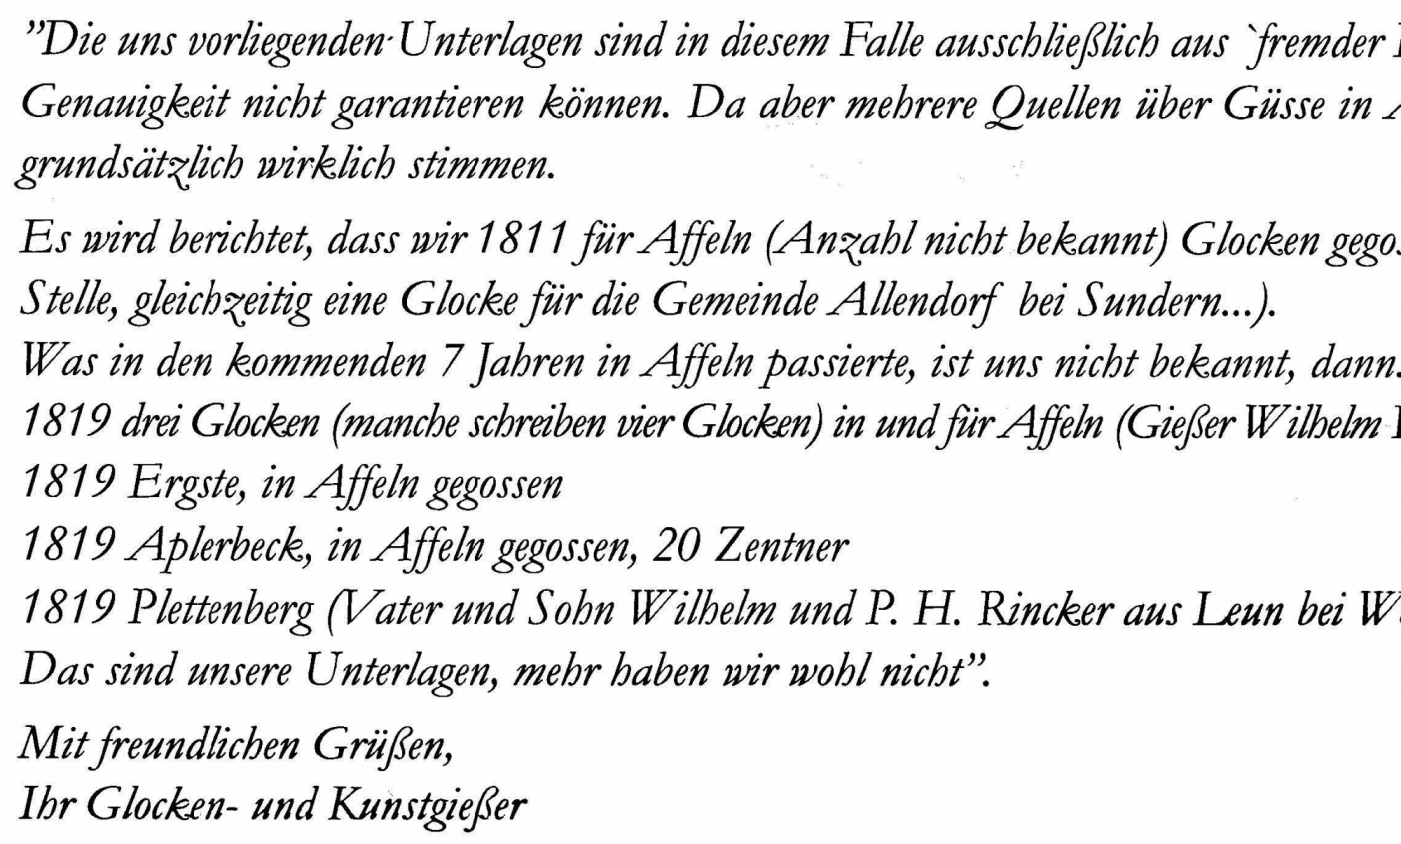 SchiefeVersalien1.thumb.png.8a464c7335fd8b22596fb5ef27cf6049.png